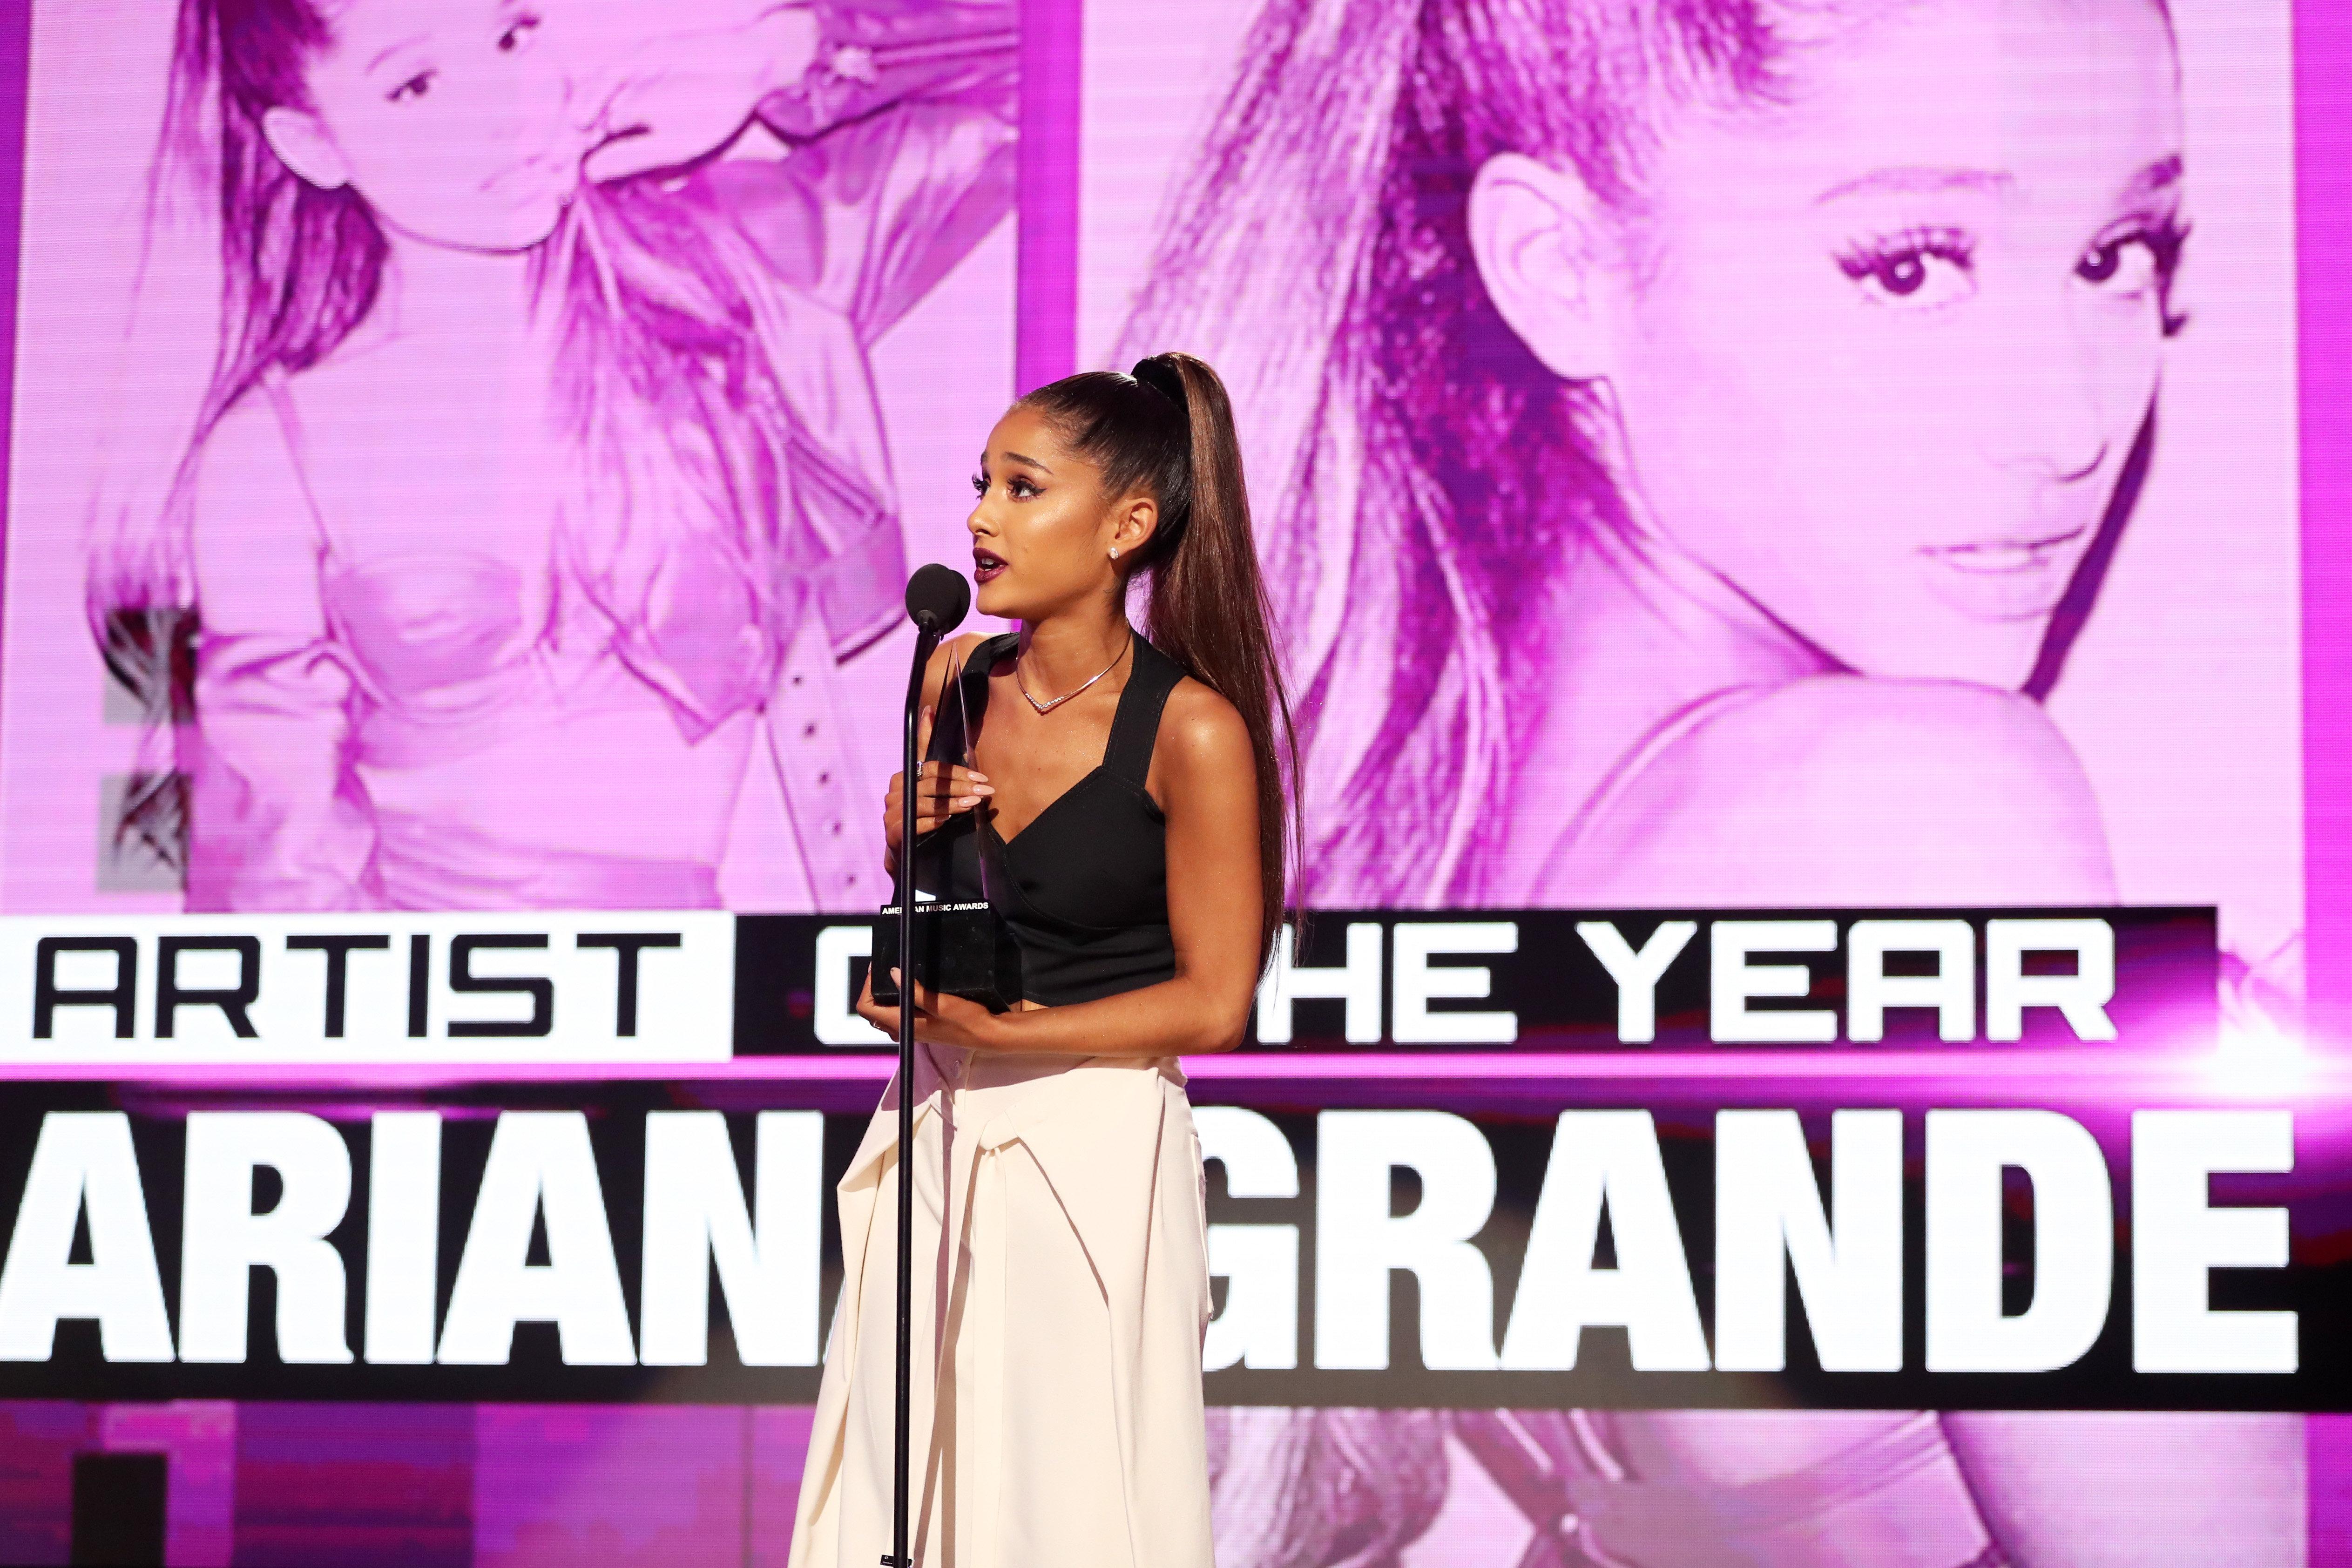 Ariana Grande sent her condolences after potential terrorist attacks struck London on June 3. In the...